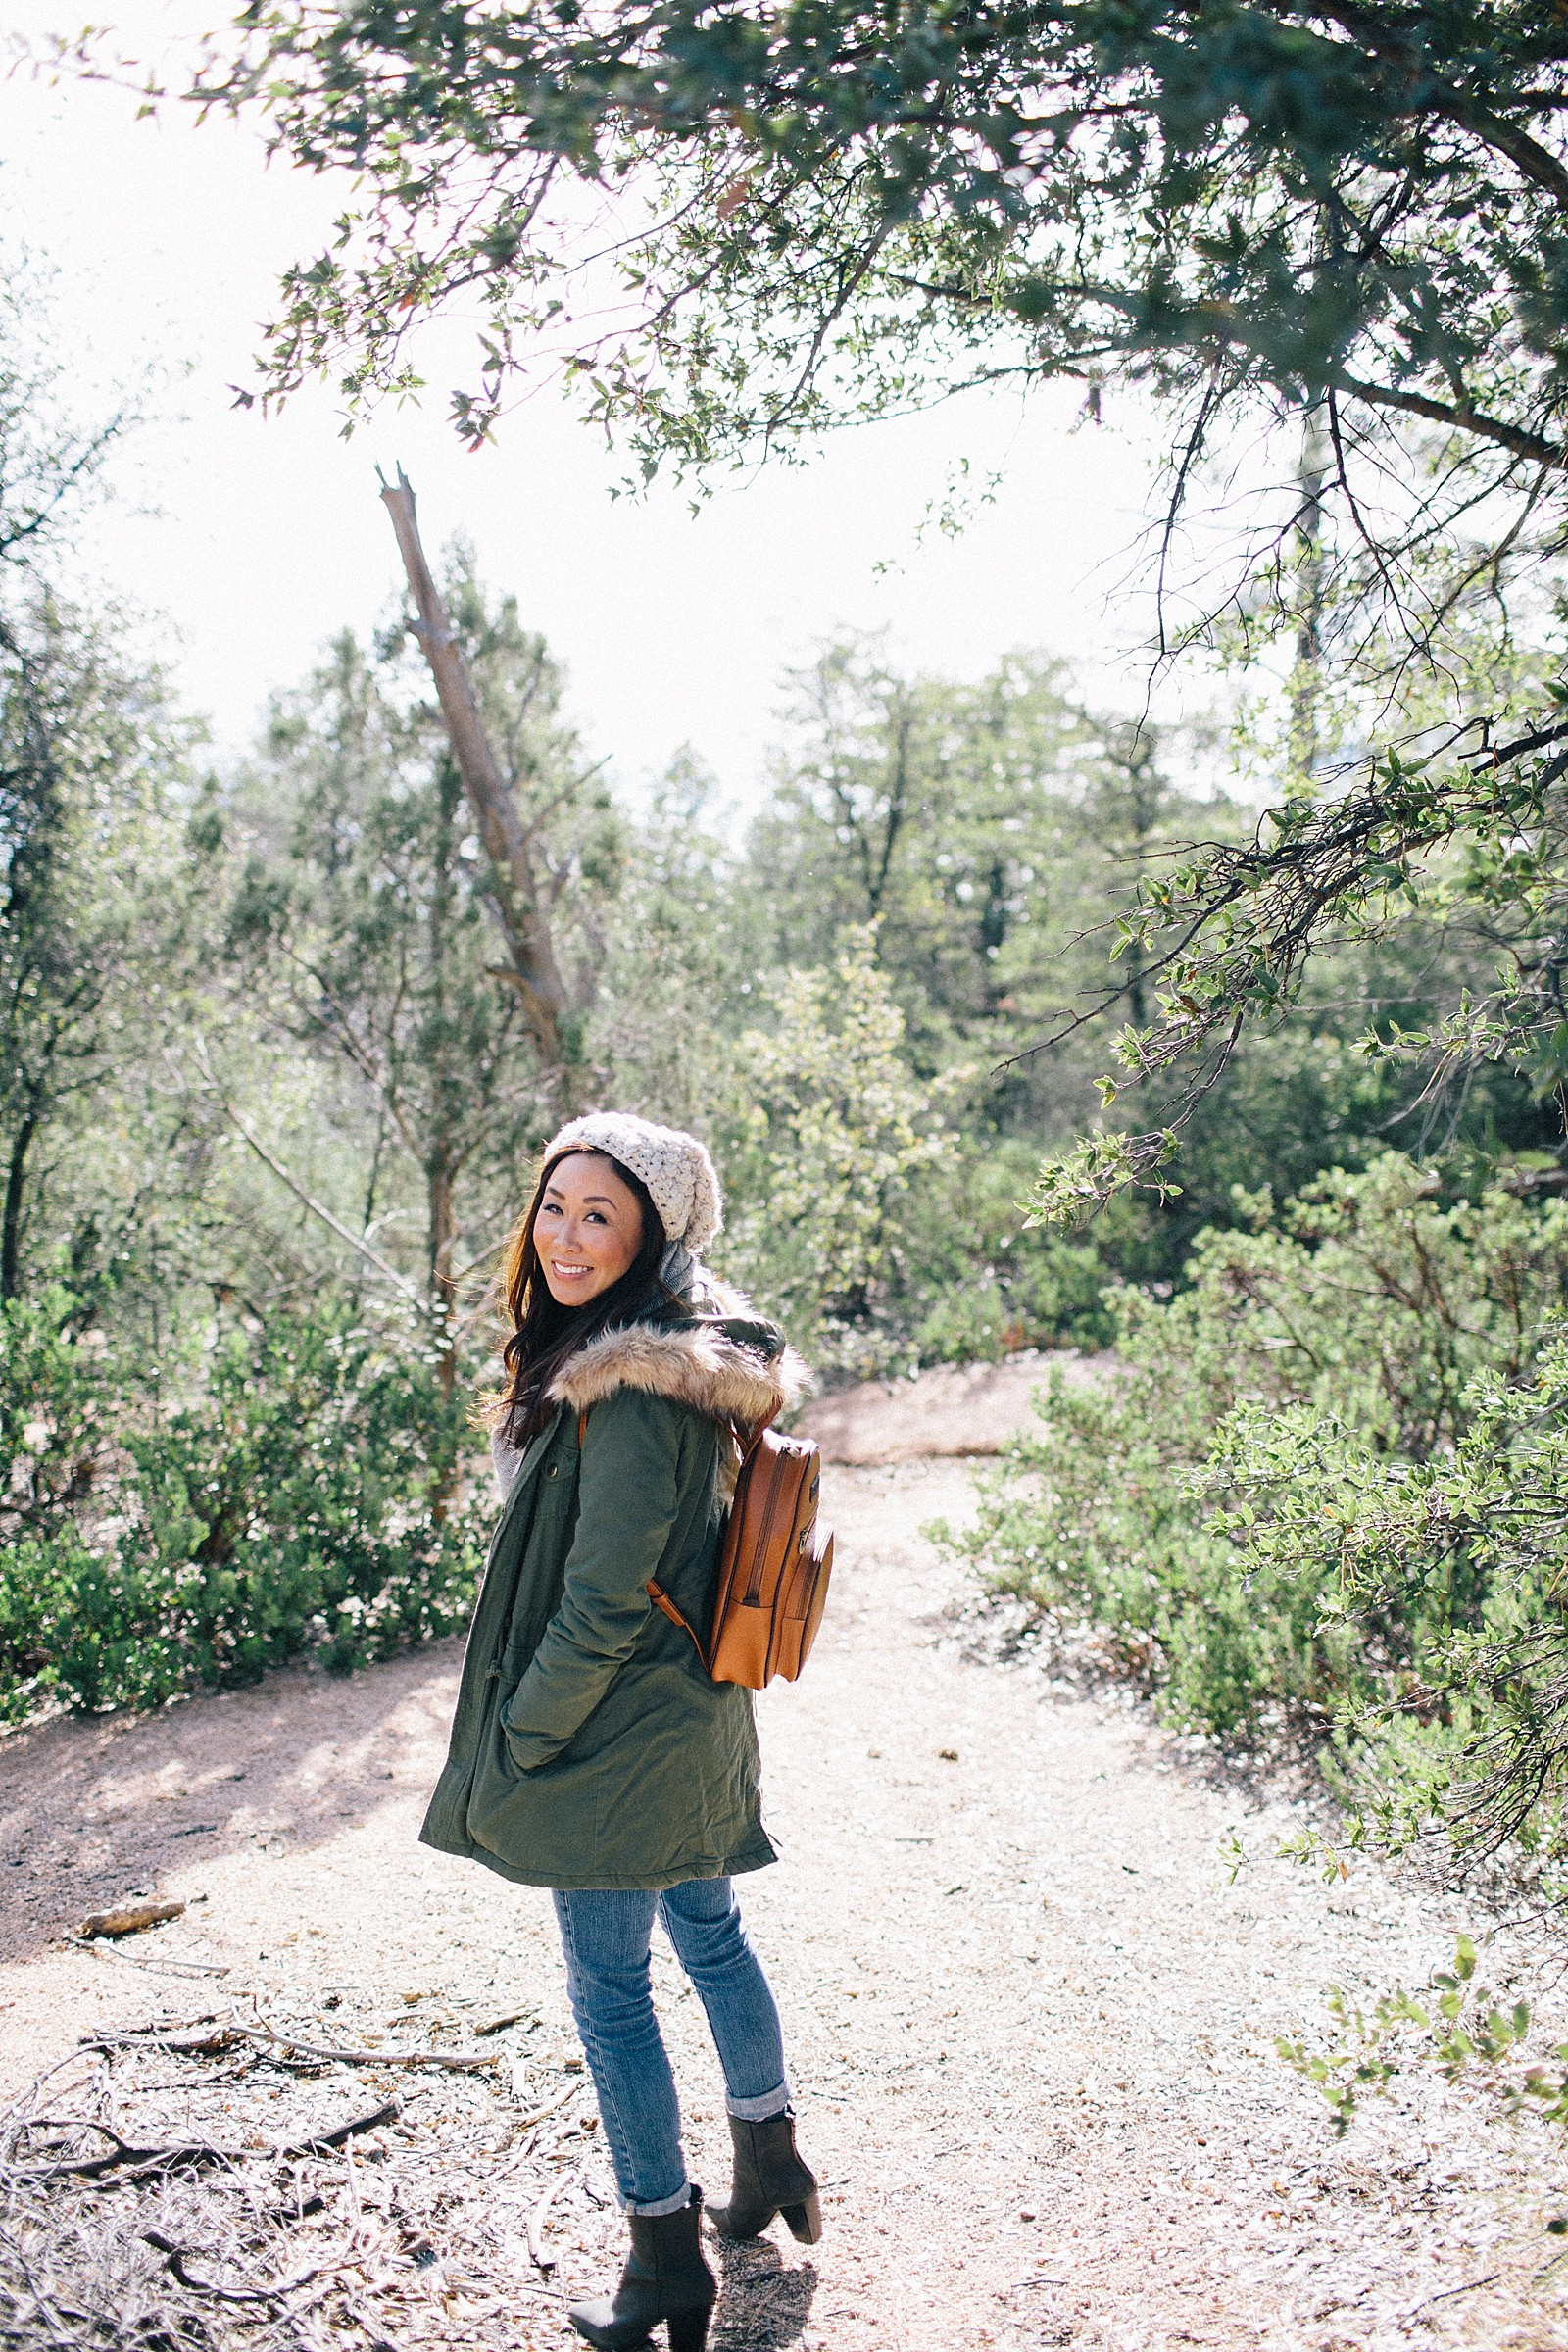 payson-arizona-phoenix-blogger-lifestyle-fashion-beauty-leather-backpack-travel-capolavori-3190